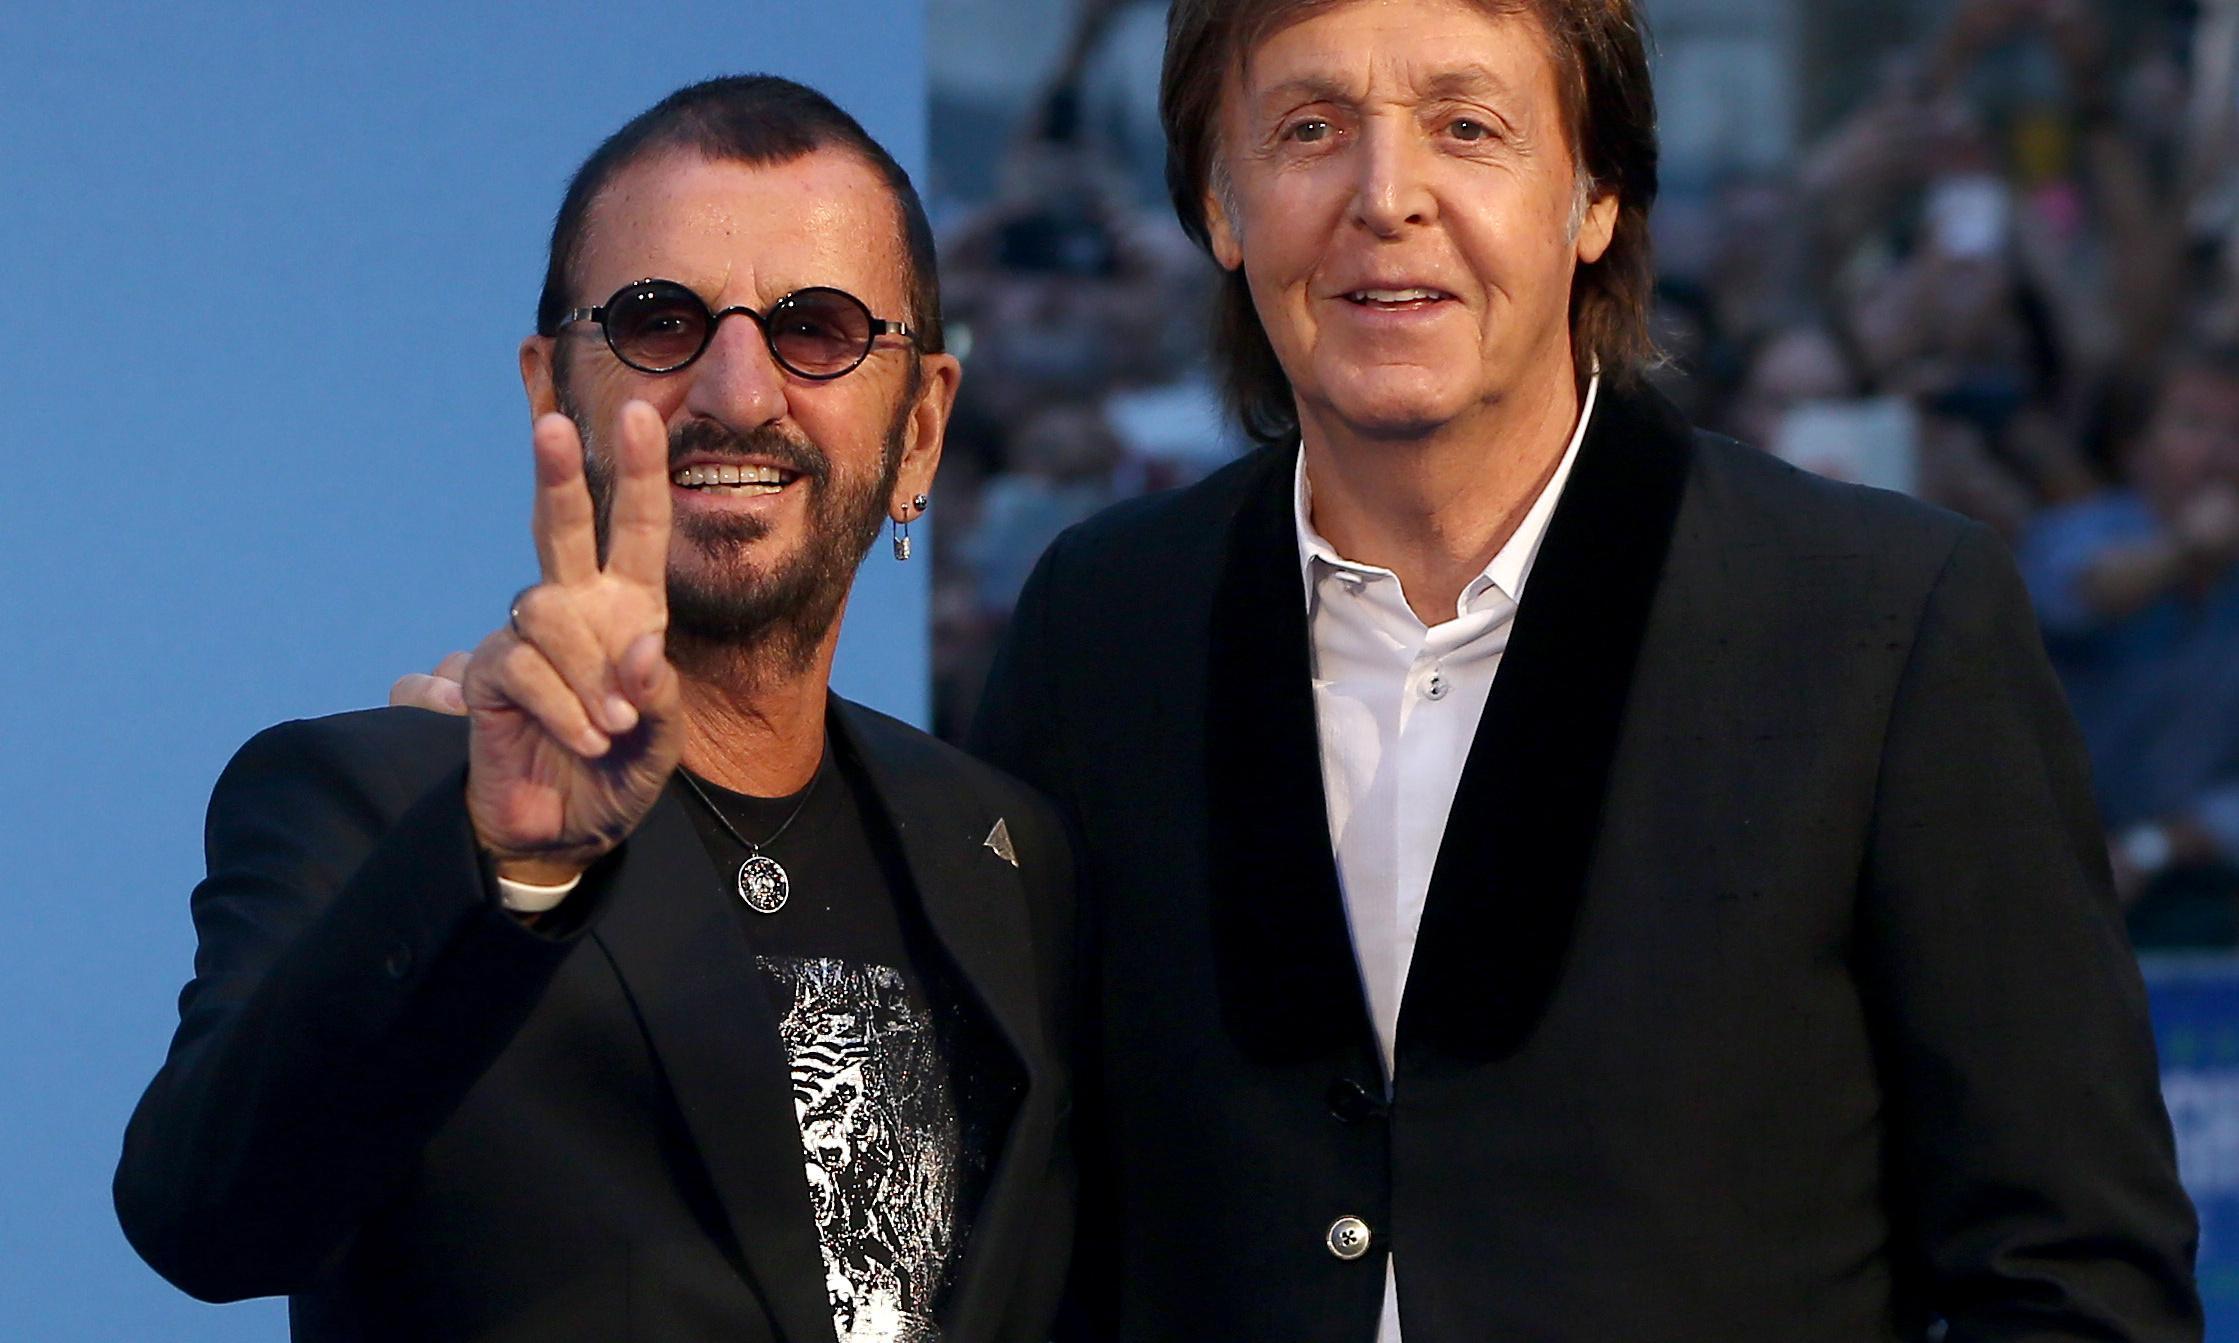 Paul McCartney and Ringo Starr reunite to record John Lennon song